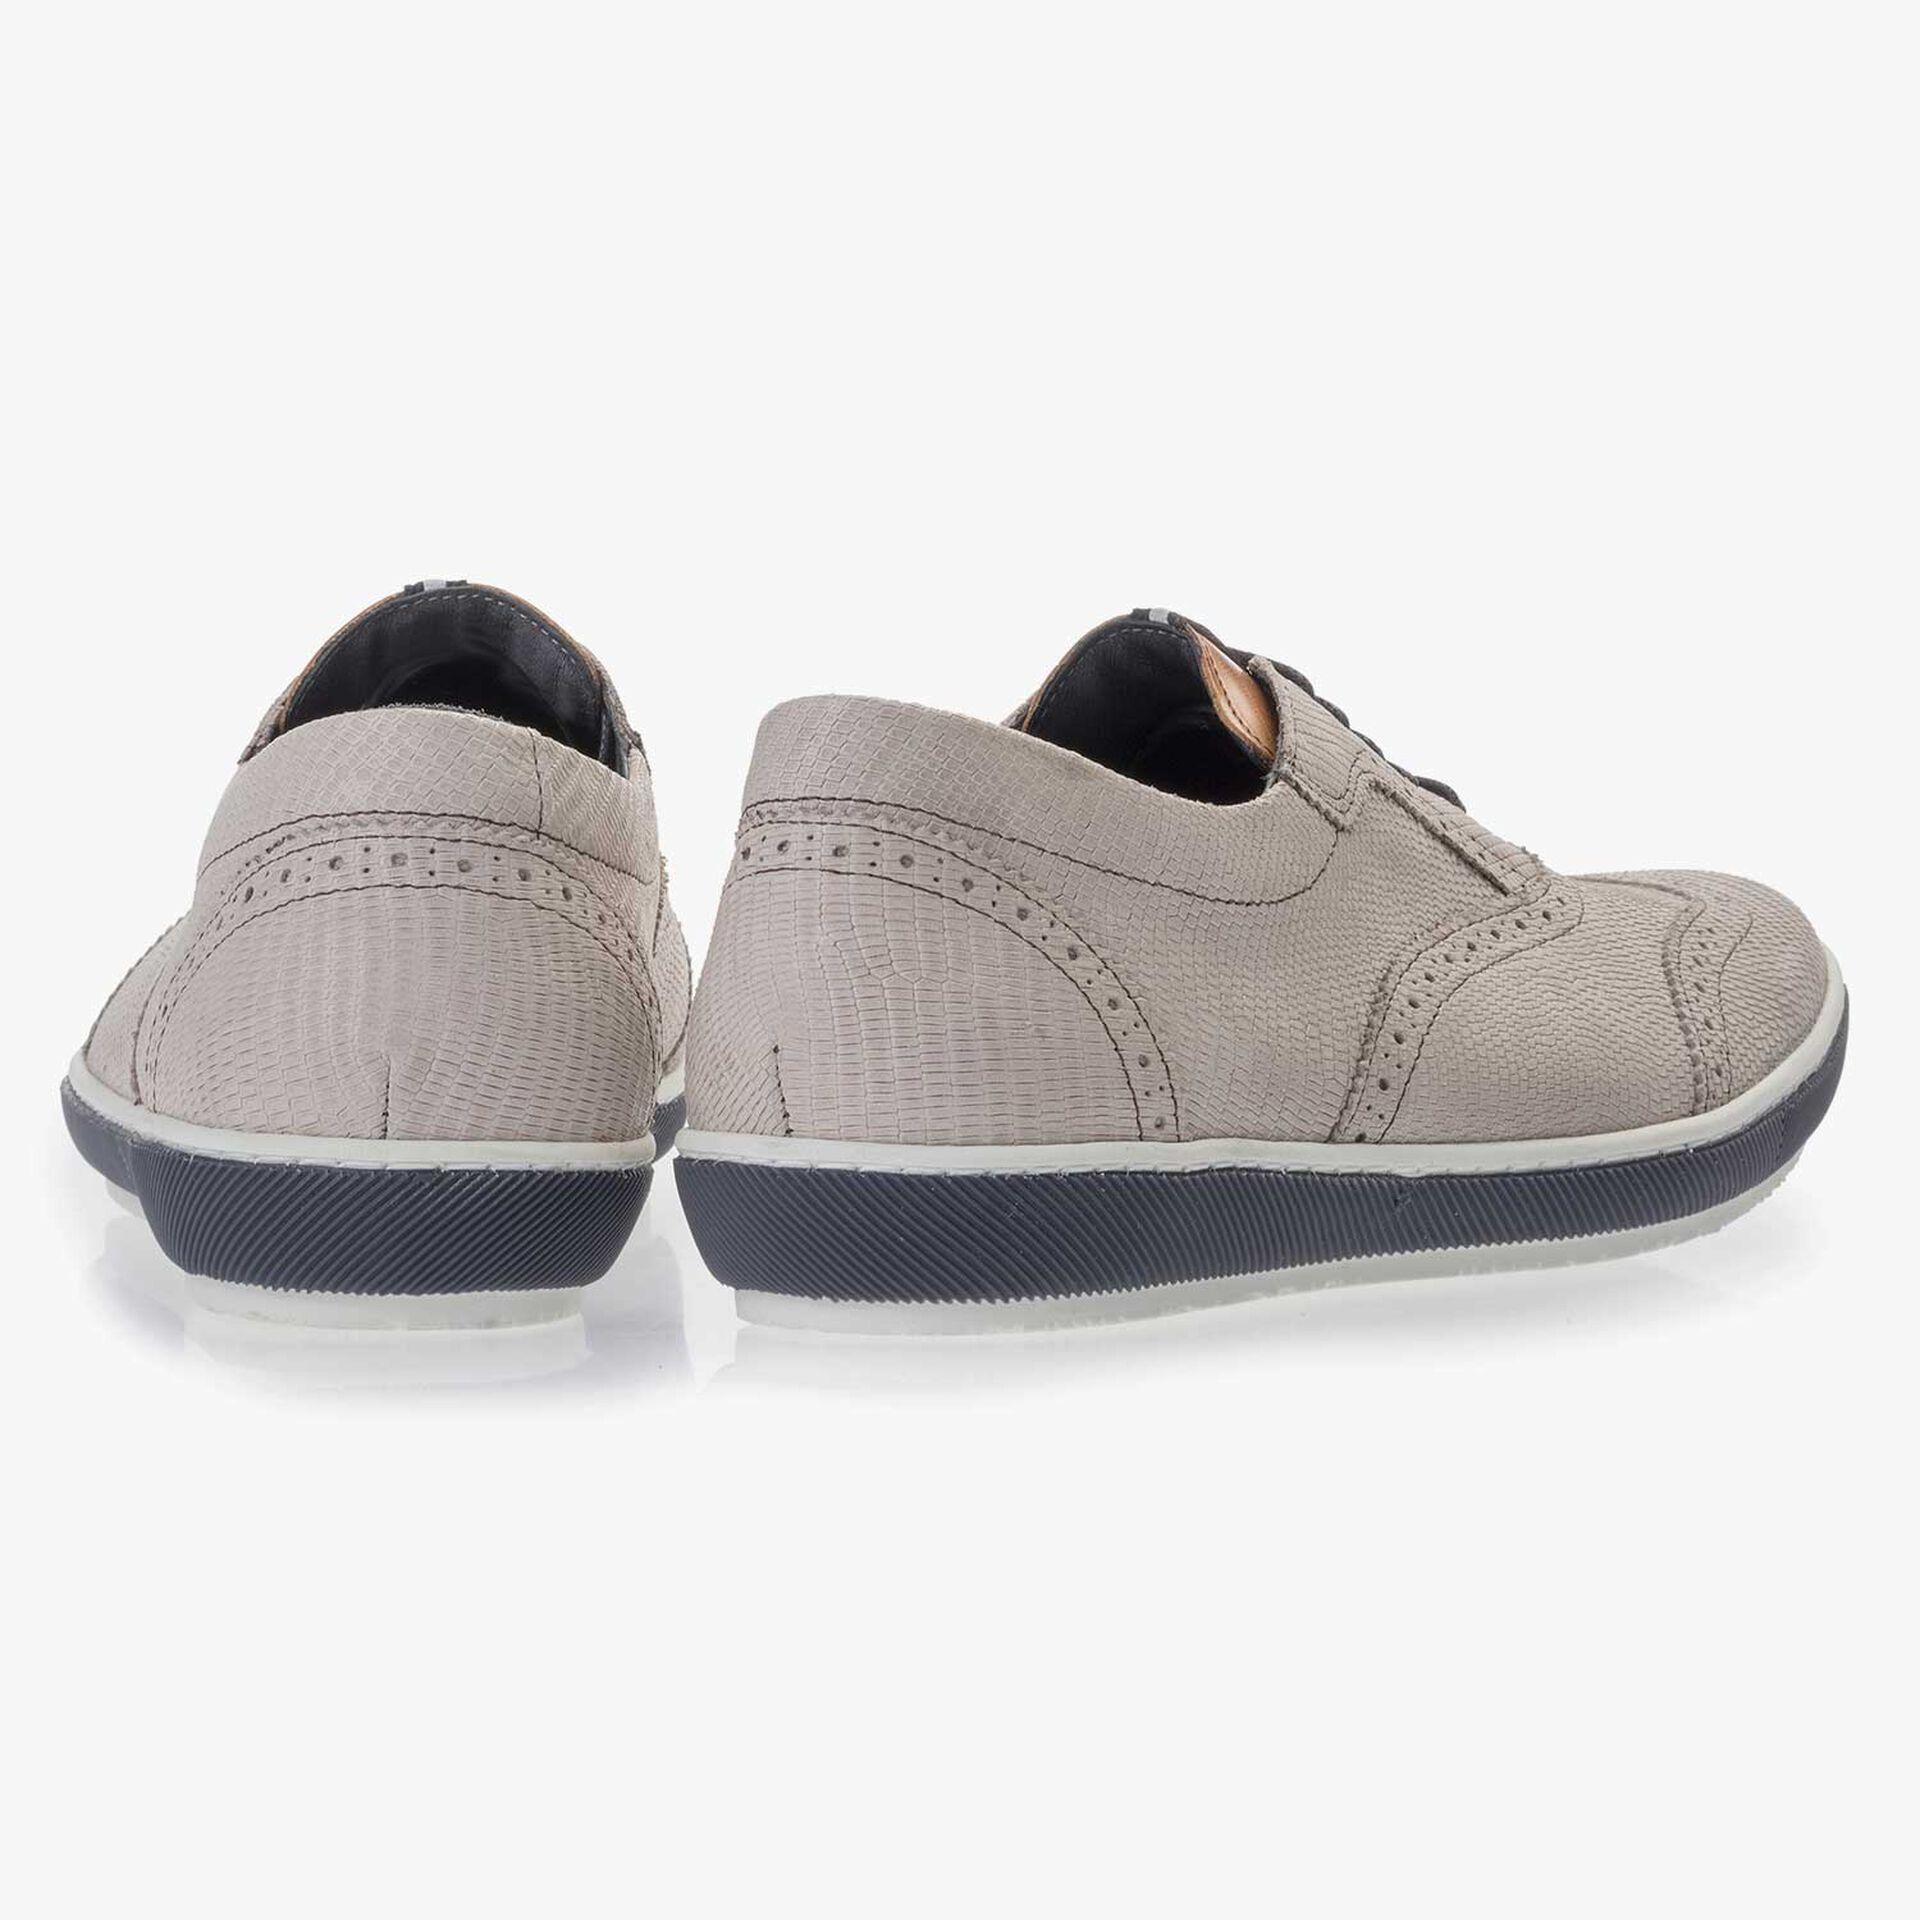 White nubuck leather brogue sneaker